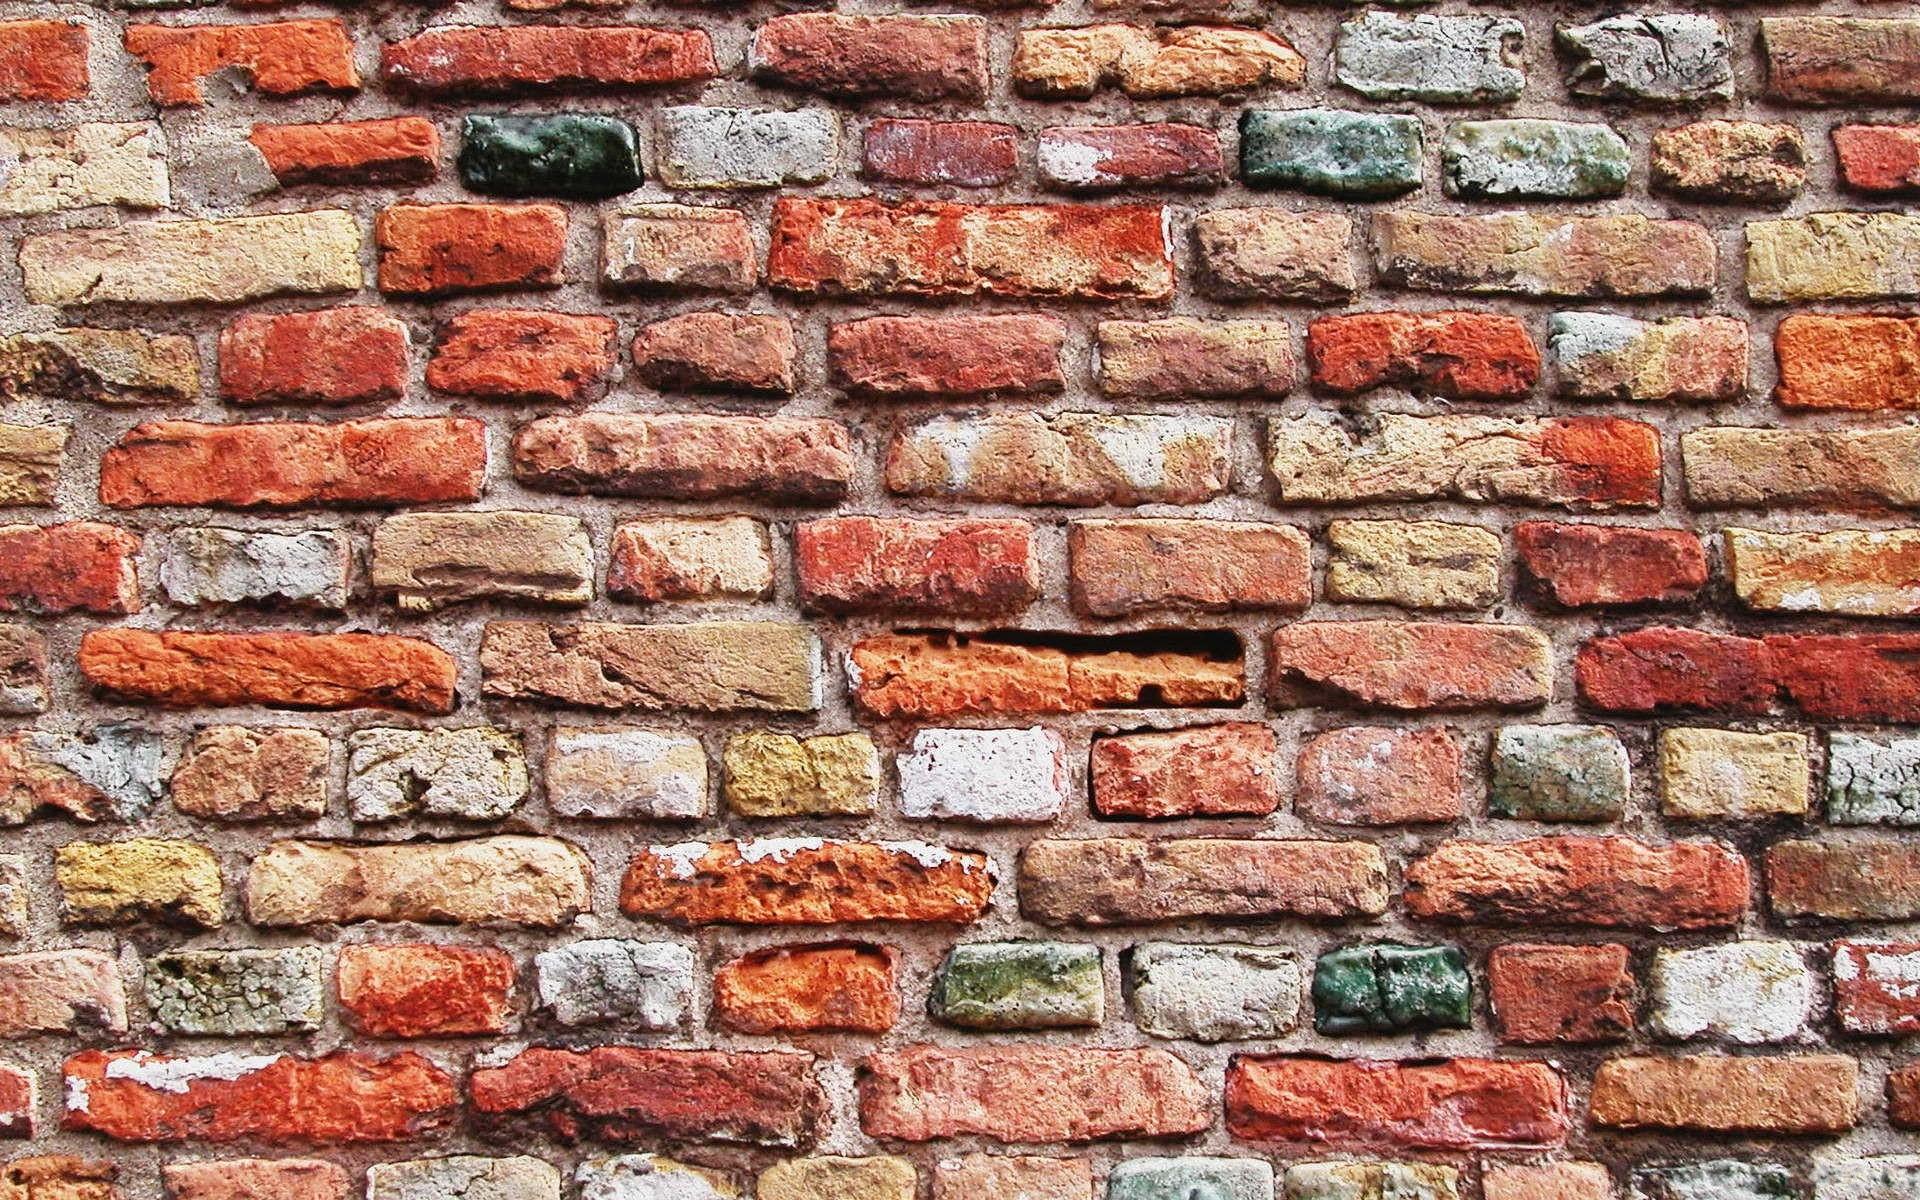 Textura de pared de ladrillos - 1920x1200